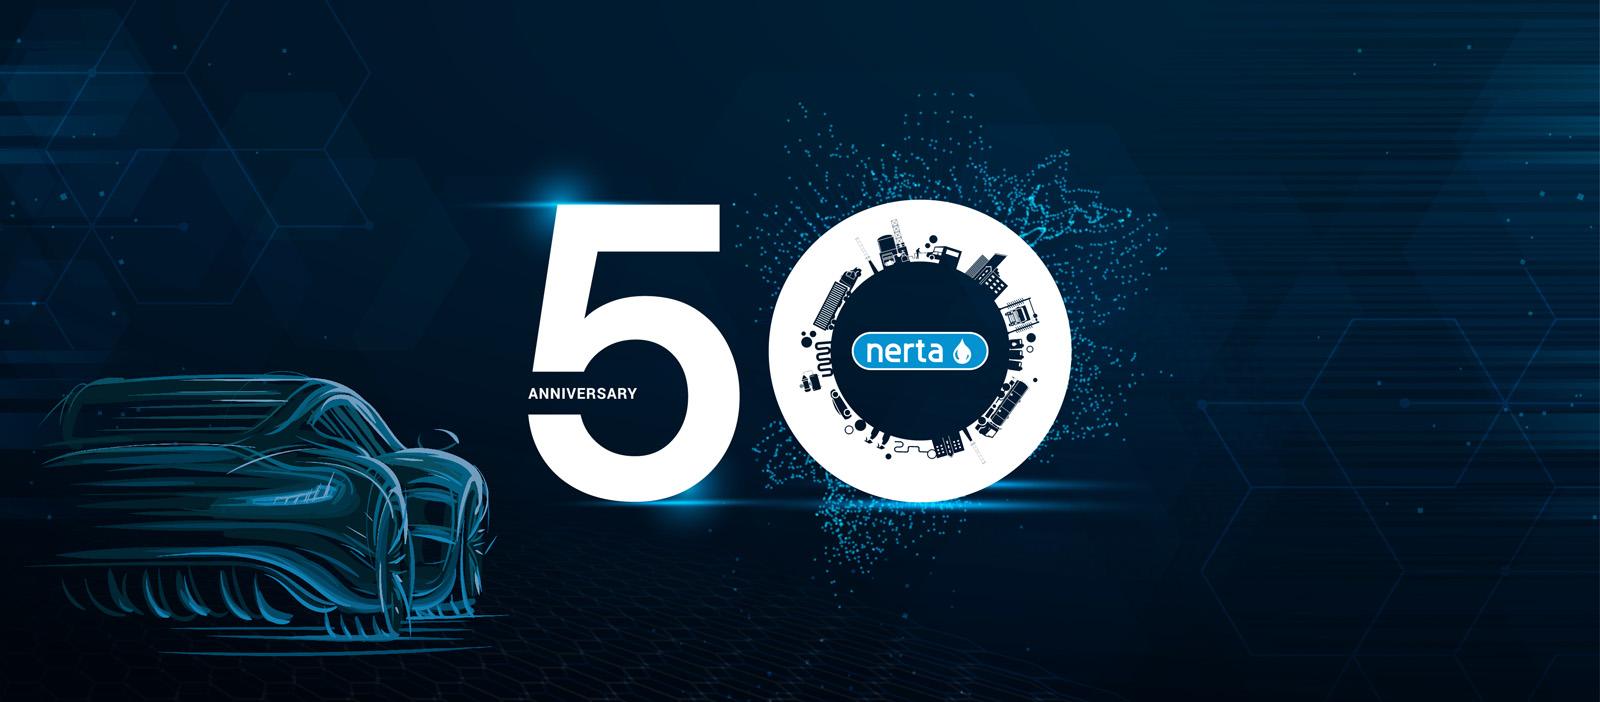 nerta 50